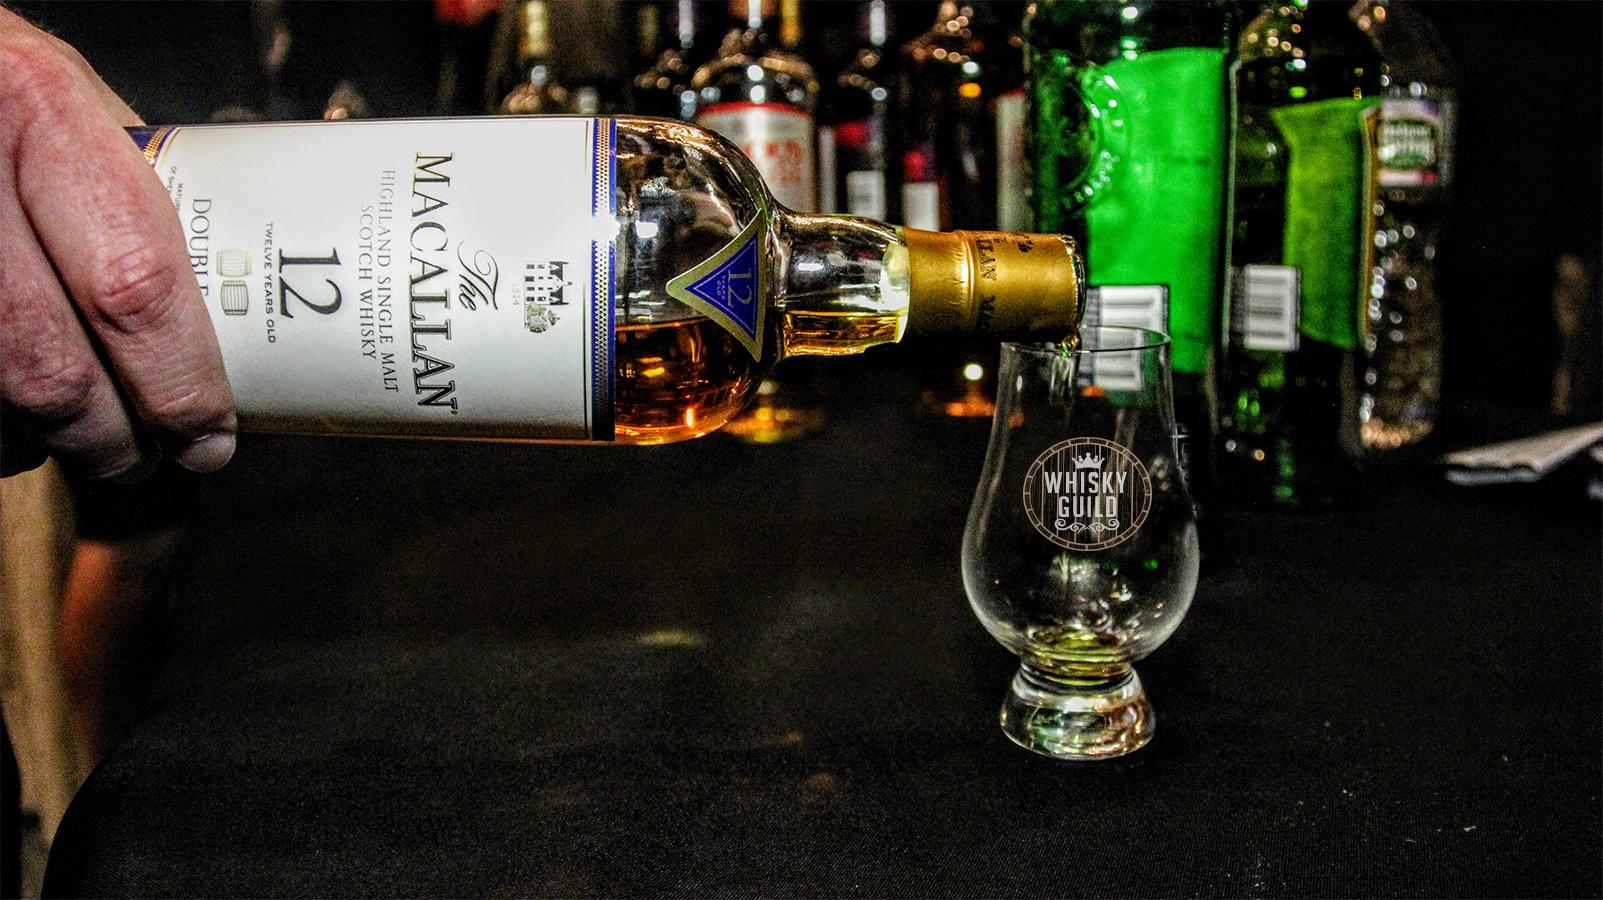 Whisky Pour